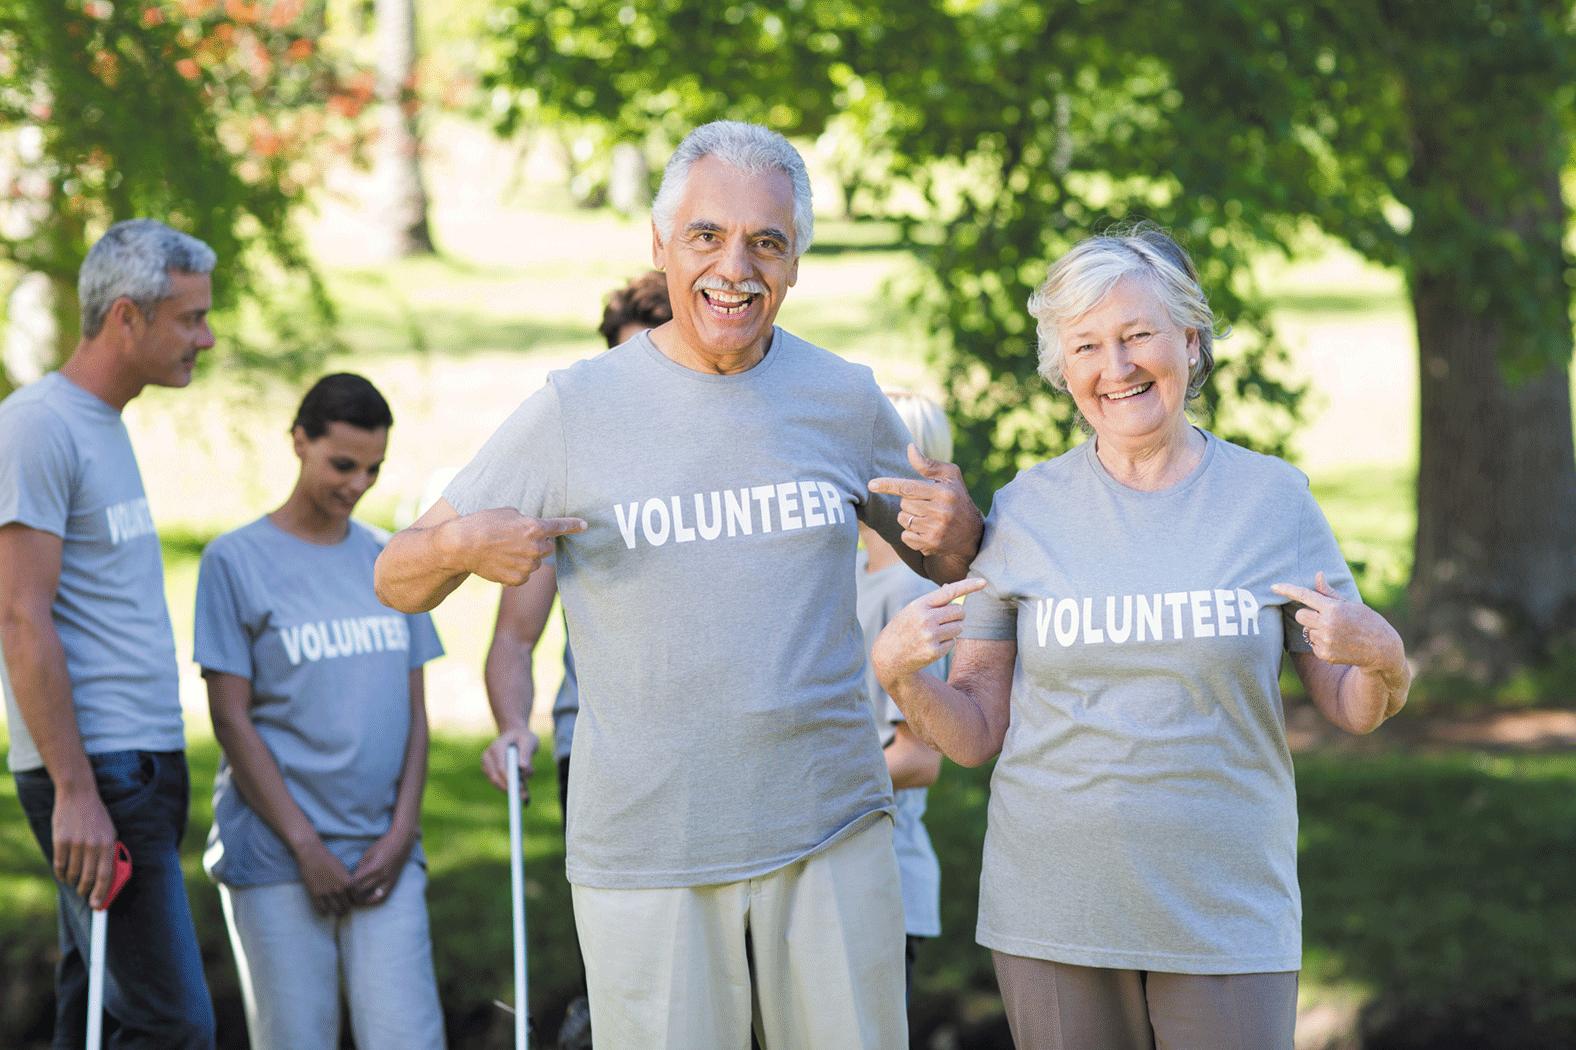 volunteering-community-service